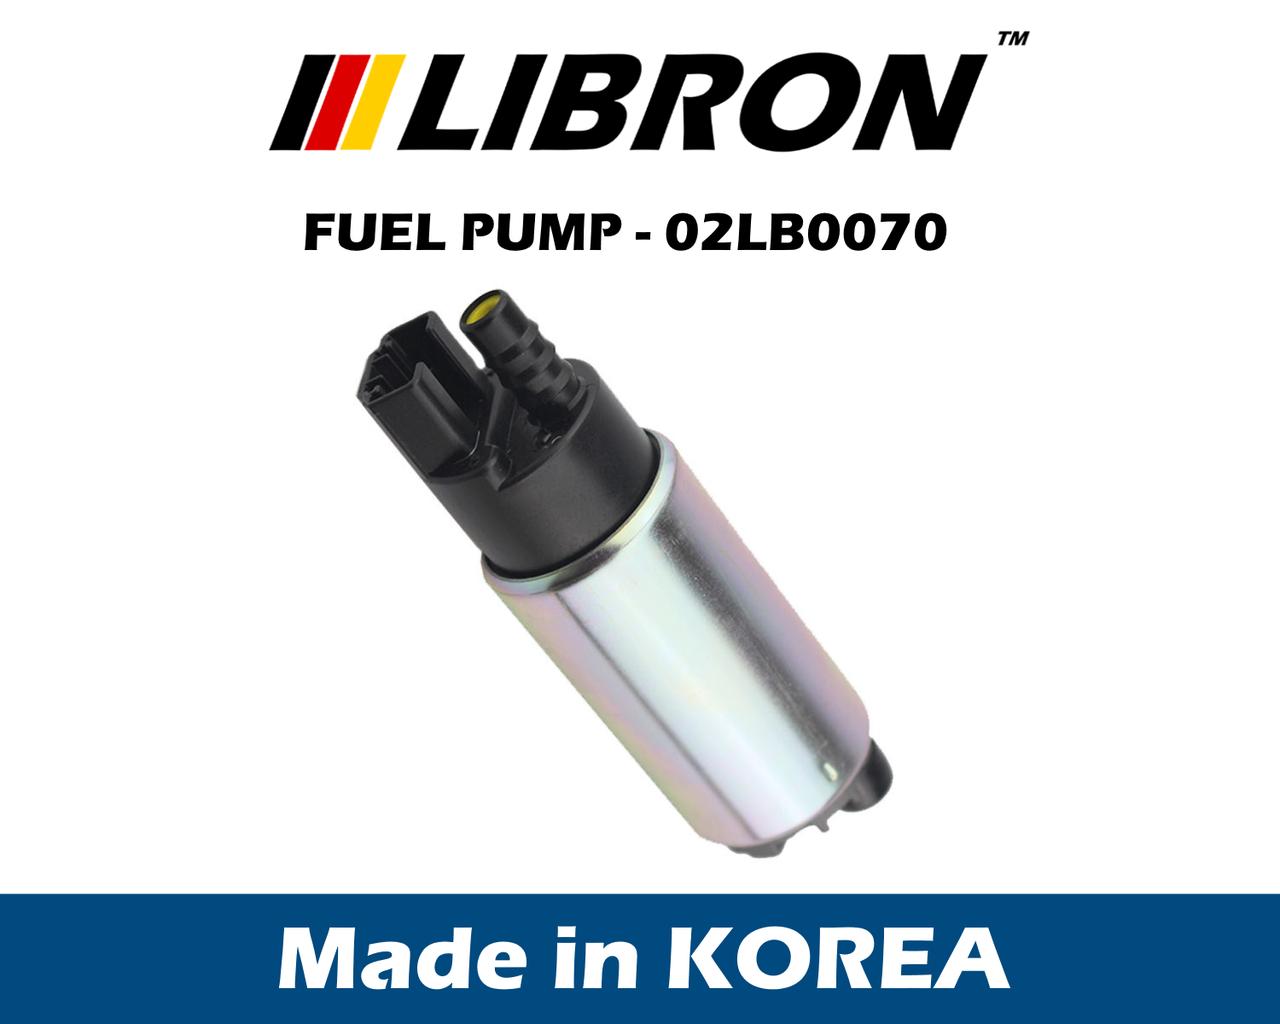 Топливный насос LIBRON 02LB0070 - JEEP GRAND CHEROKEE I (1997-1999)